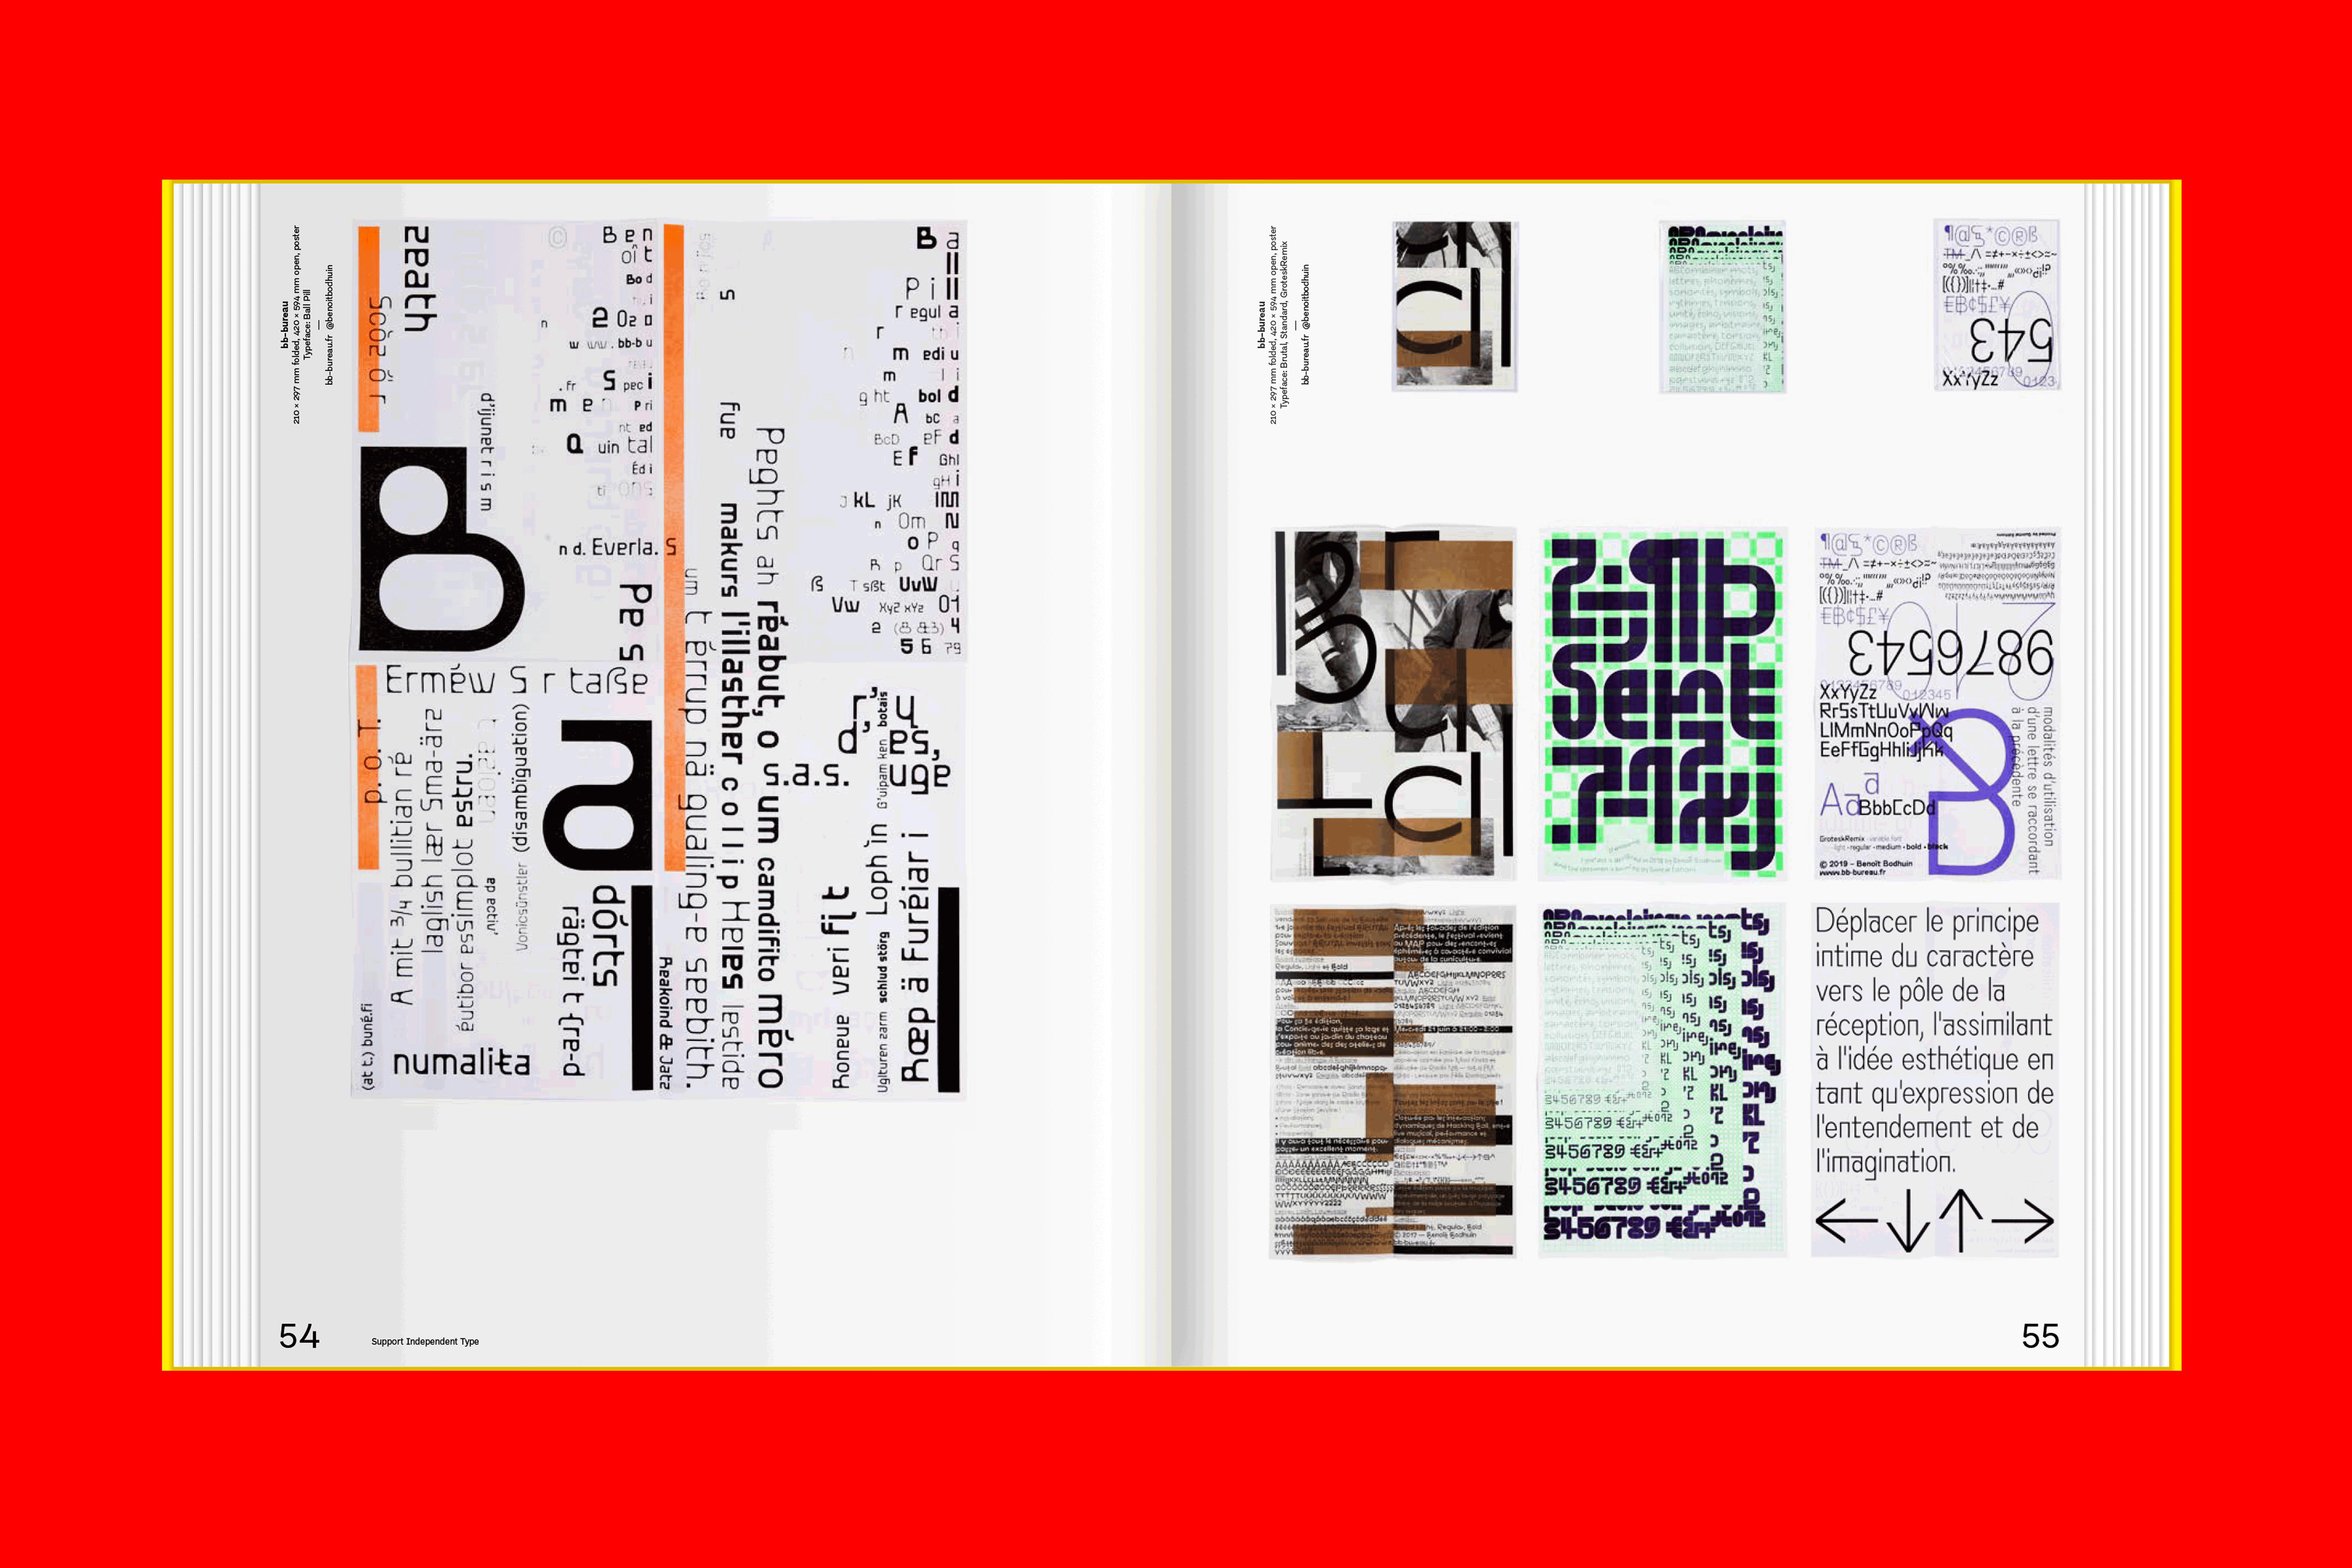 Slanted-Publiaktionen-Slanted-Publishers-Support-Independent-Type_13